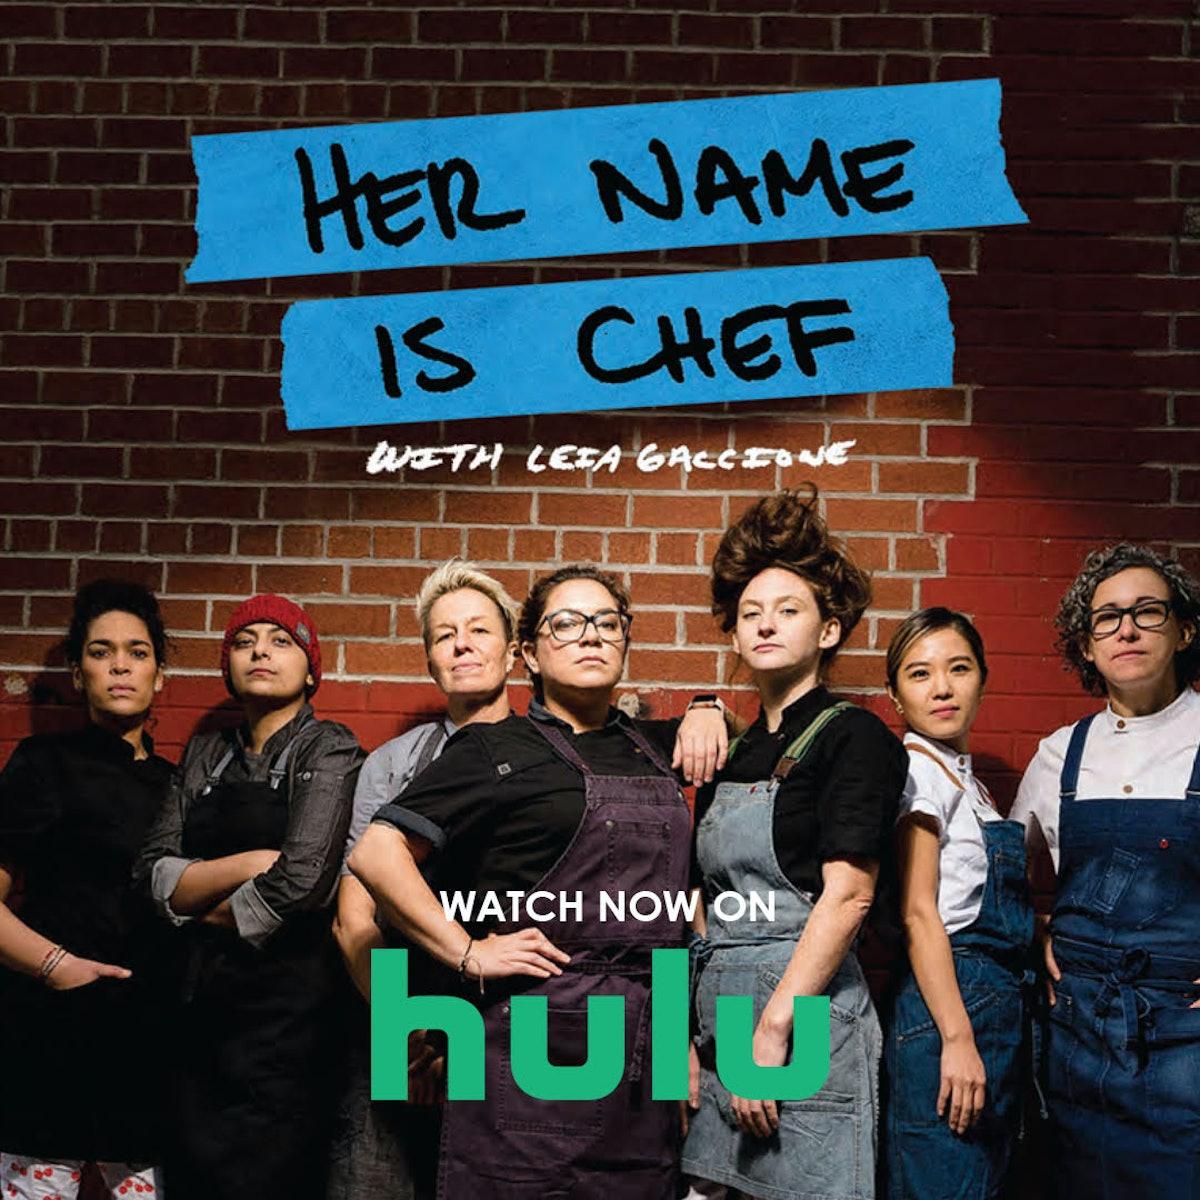 The film features Fatima Ali, Esther Choi, Elizabeth Falkner, Juliet Masters, Caroline Schiff, and Hillary Sterling.